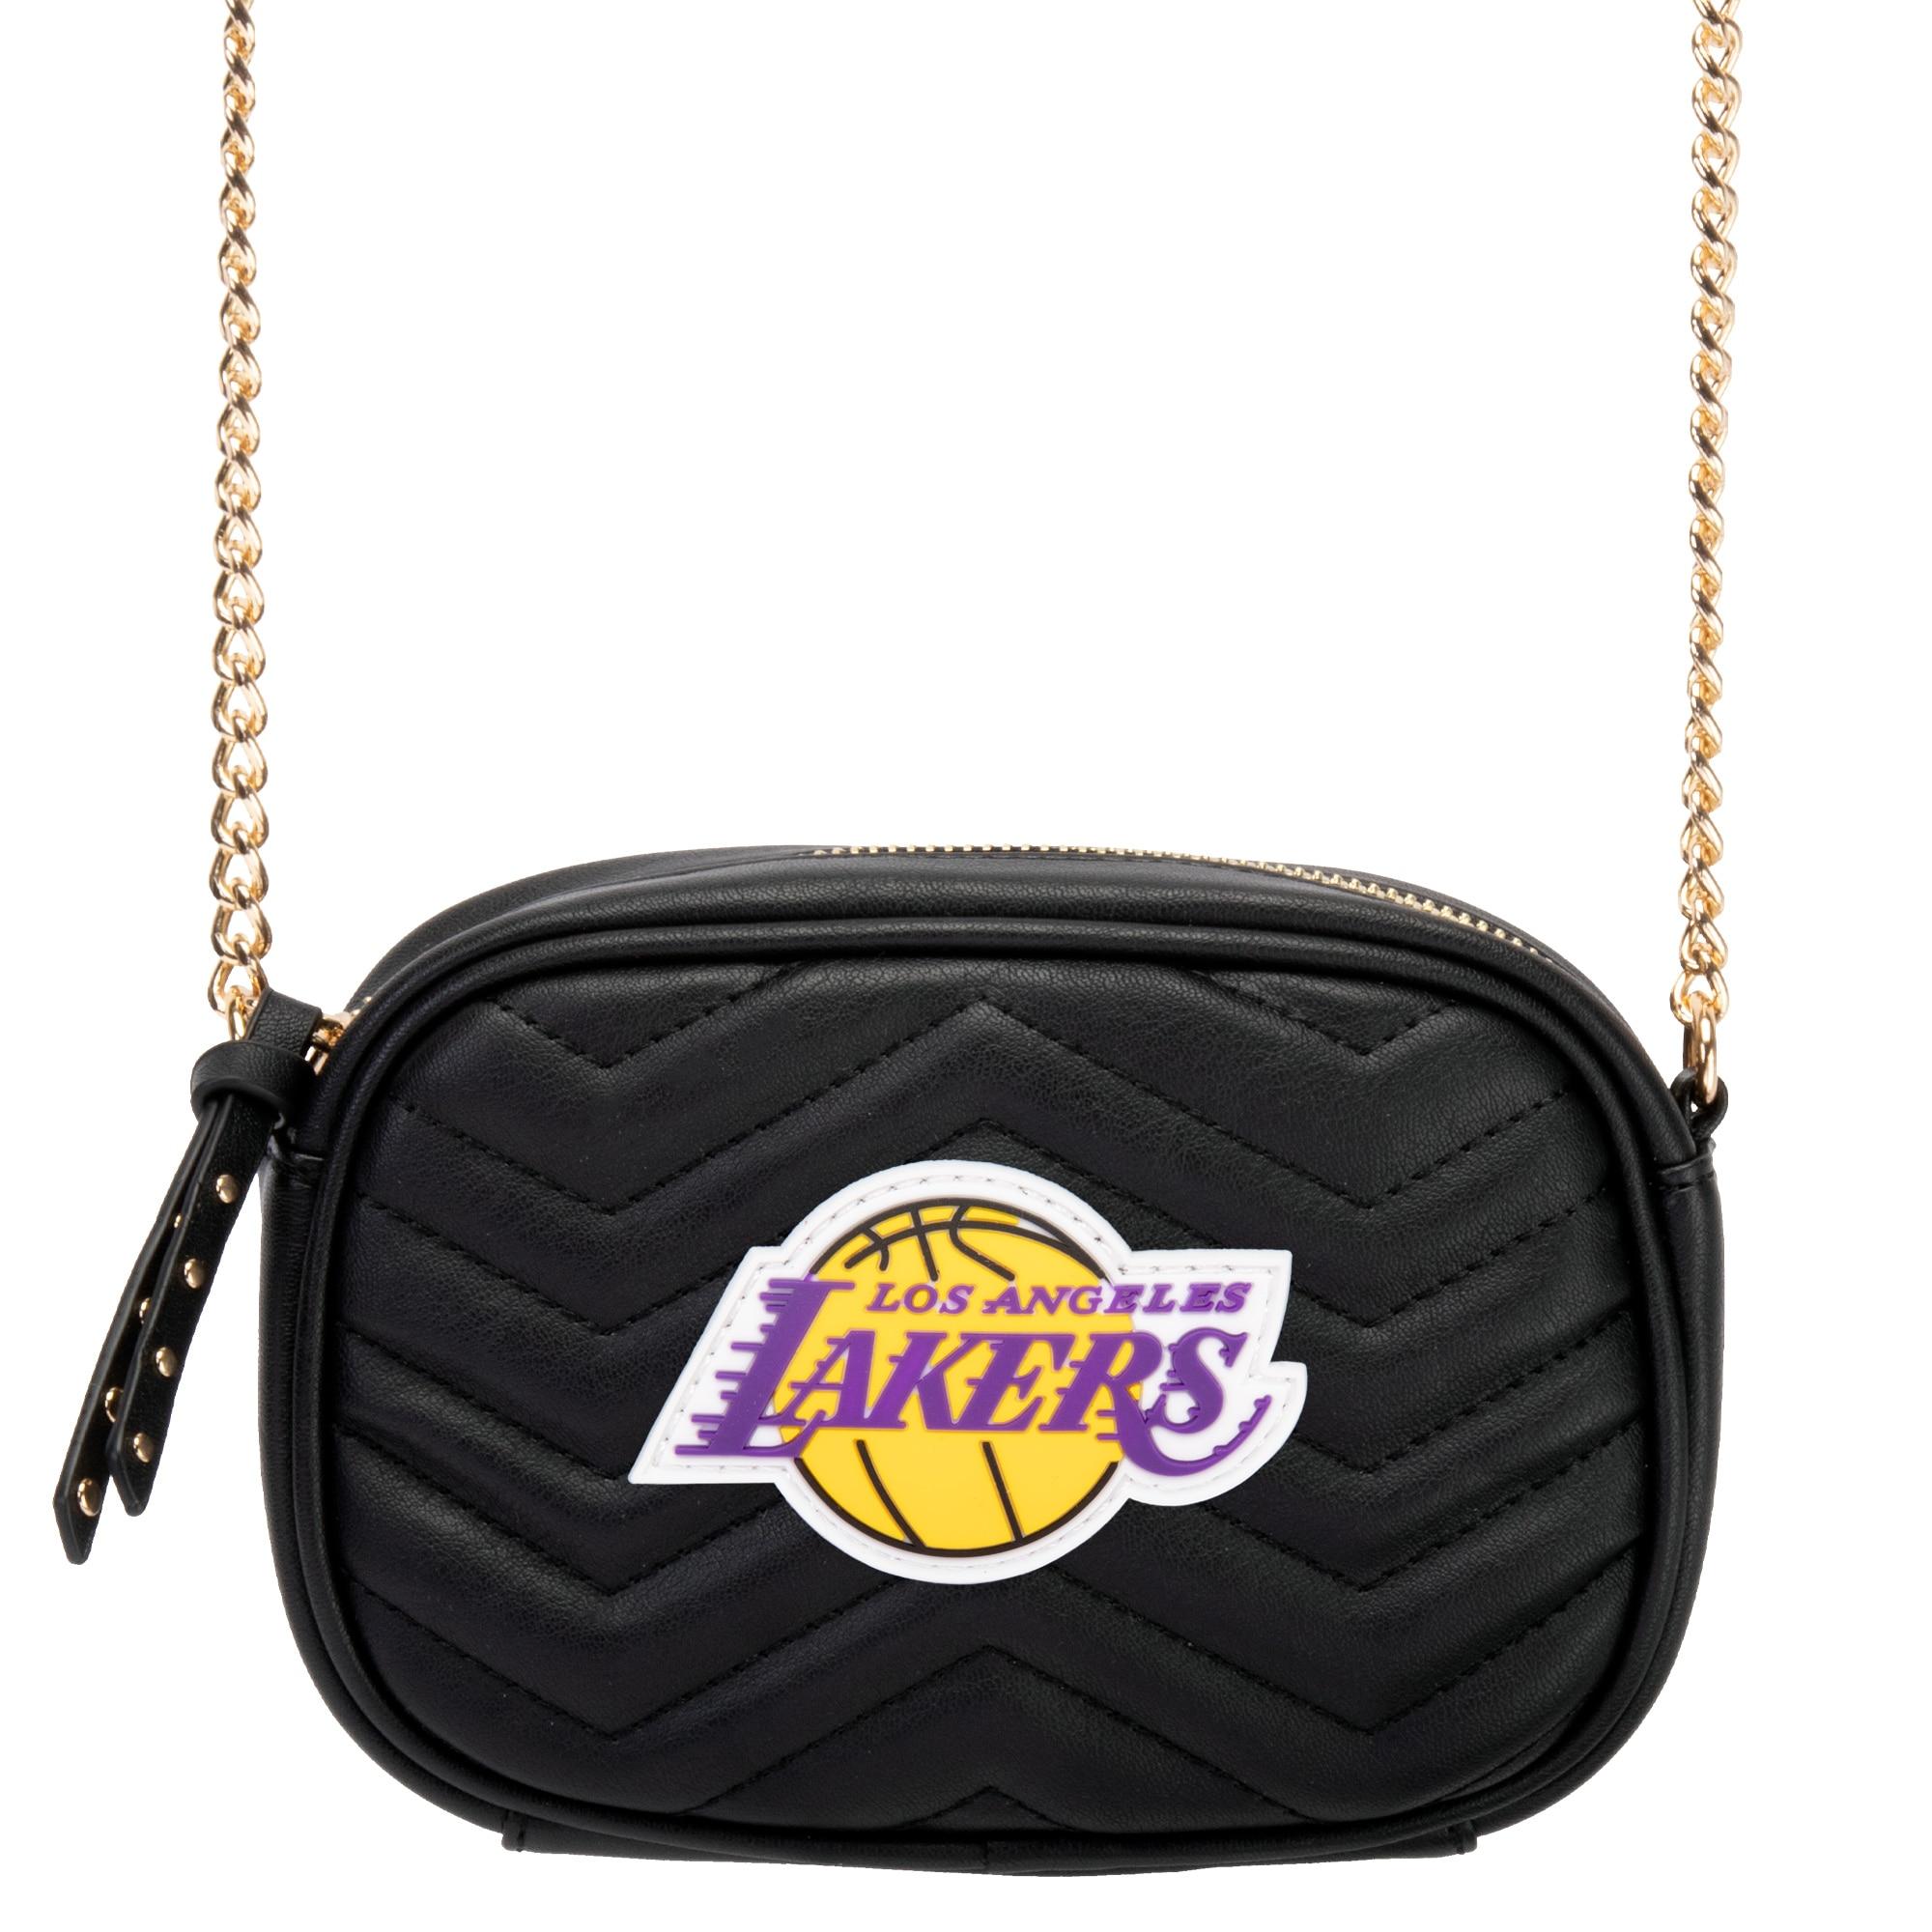 Los Angeles Lakers Women's Crossbody Bag - Black